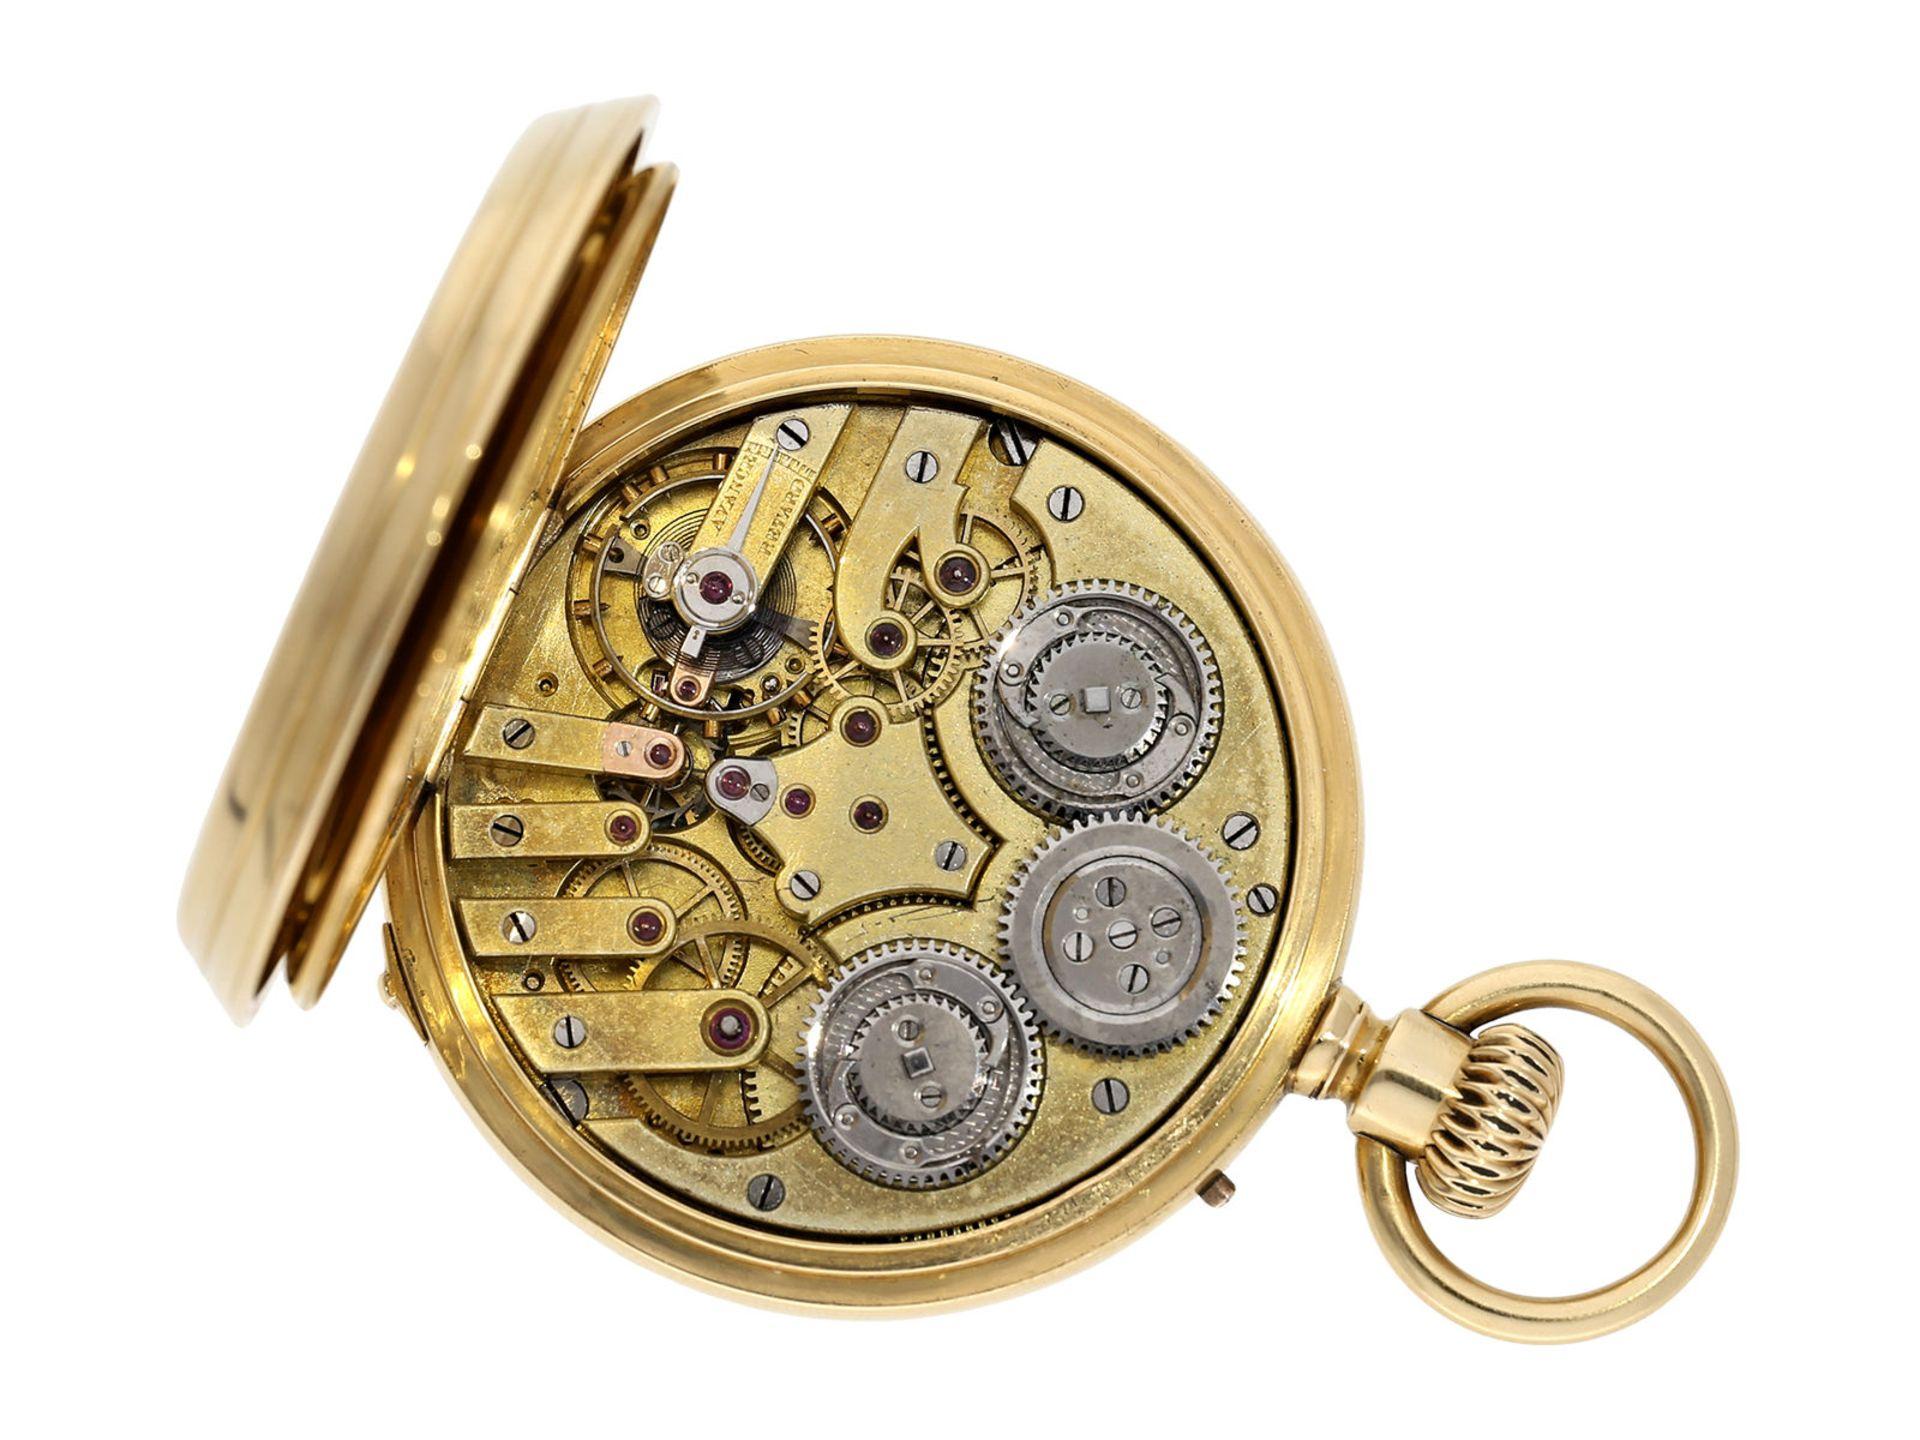 Pocket watch: early precision pocket watch with Seconde Morte, very fine quality, DuBois & LeRoy No. - Bild 2 aus 5